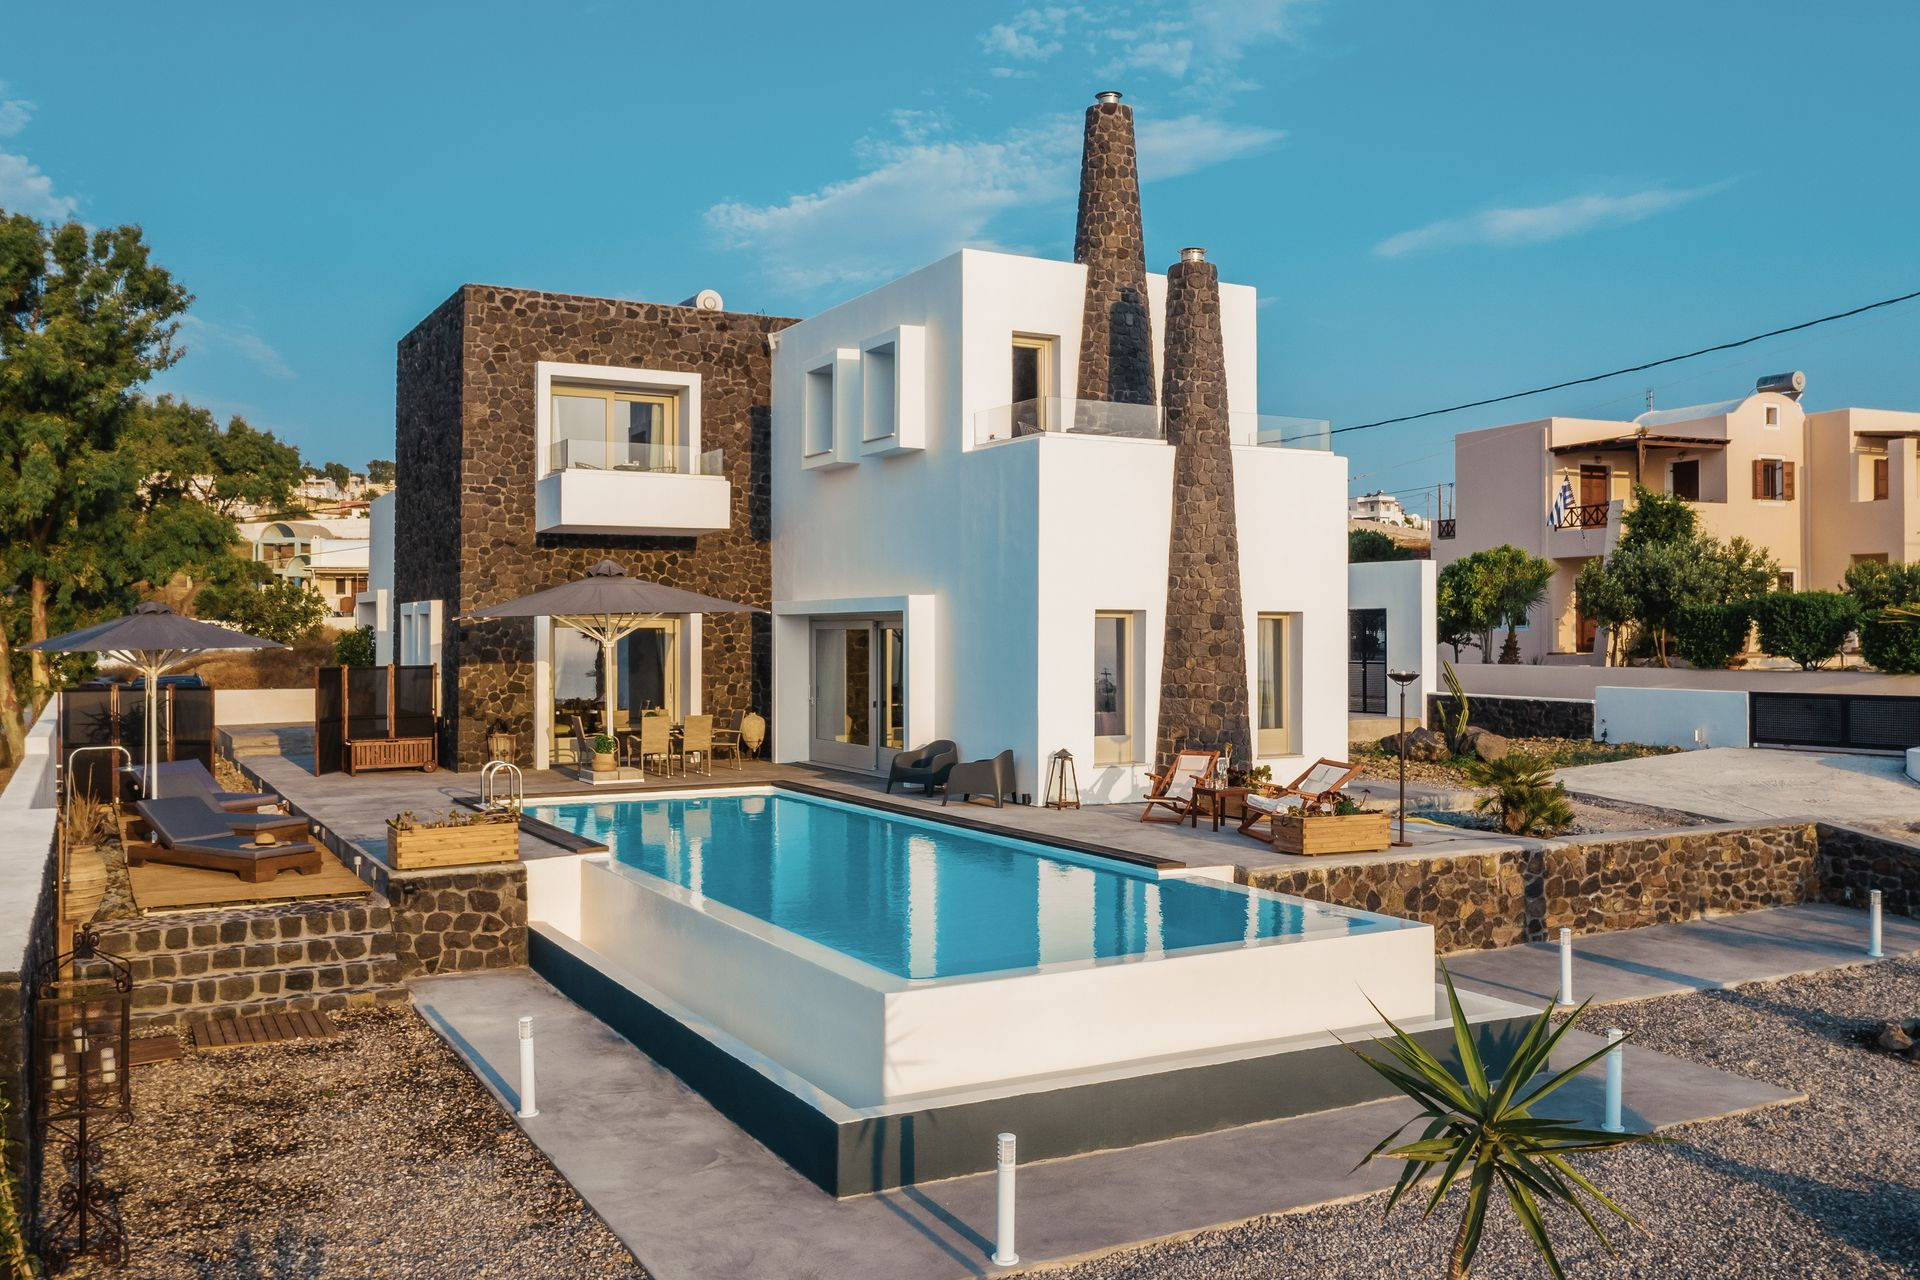 Kaminos Luxury Villa Santorini - Σαντορινη ✦ 3 Ημερες (2 Διανυκτερευσεις) ✦ 6 ατομα ✦ Χωρις Πρωινο ✦ εως 30/09/2019 ✦ Ξαπλωστρες & Ομπρελες